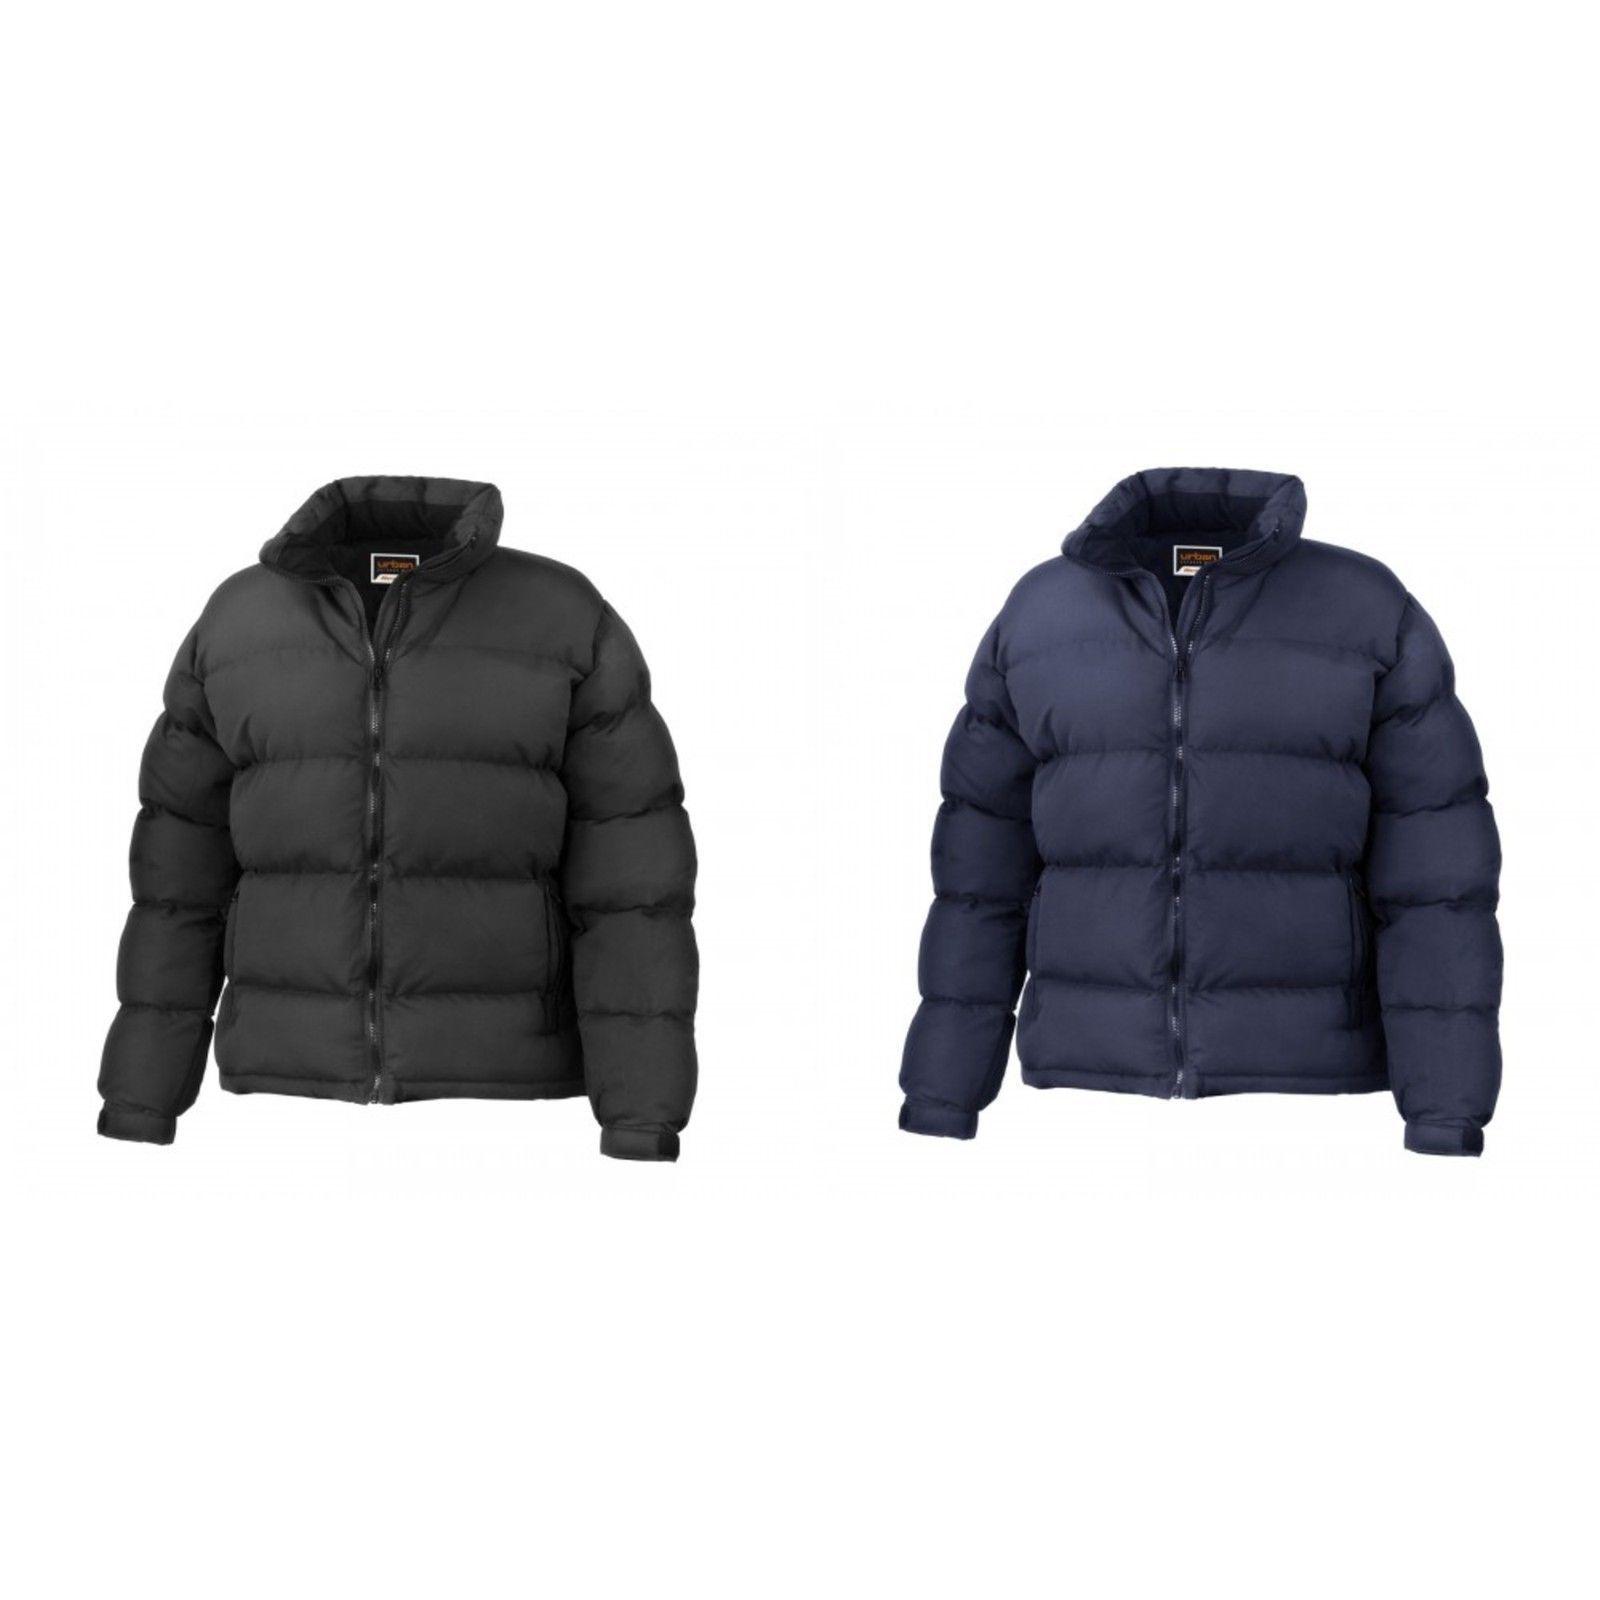 02f76af62f05 Result Womens/Ladies Urban Outdoor Holkham Down Feel Performance Jacket/Coat